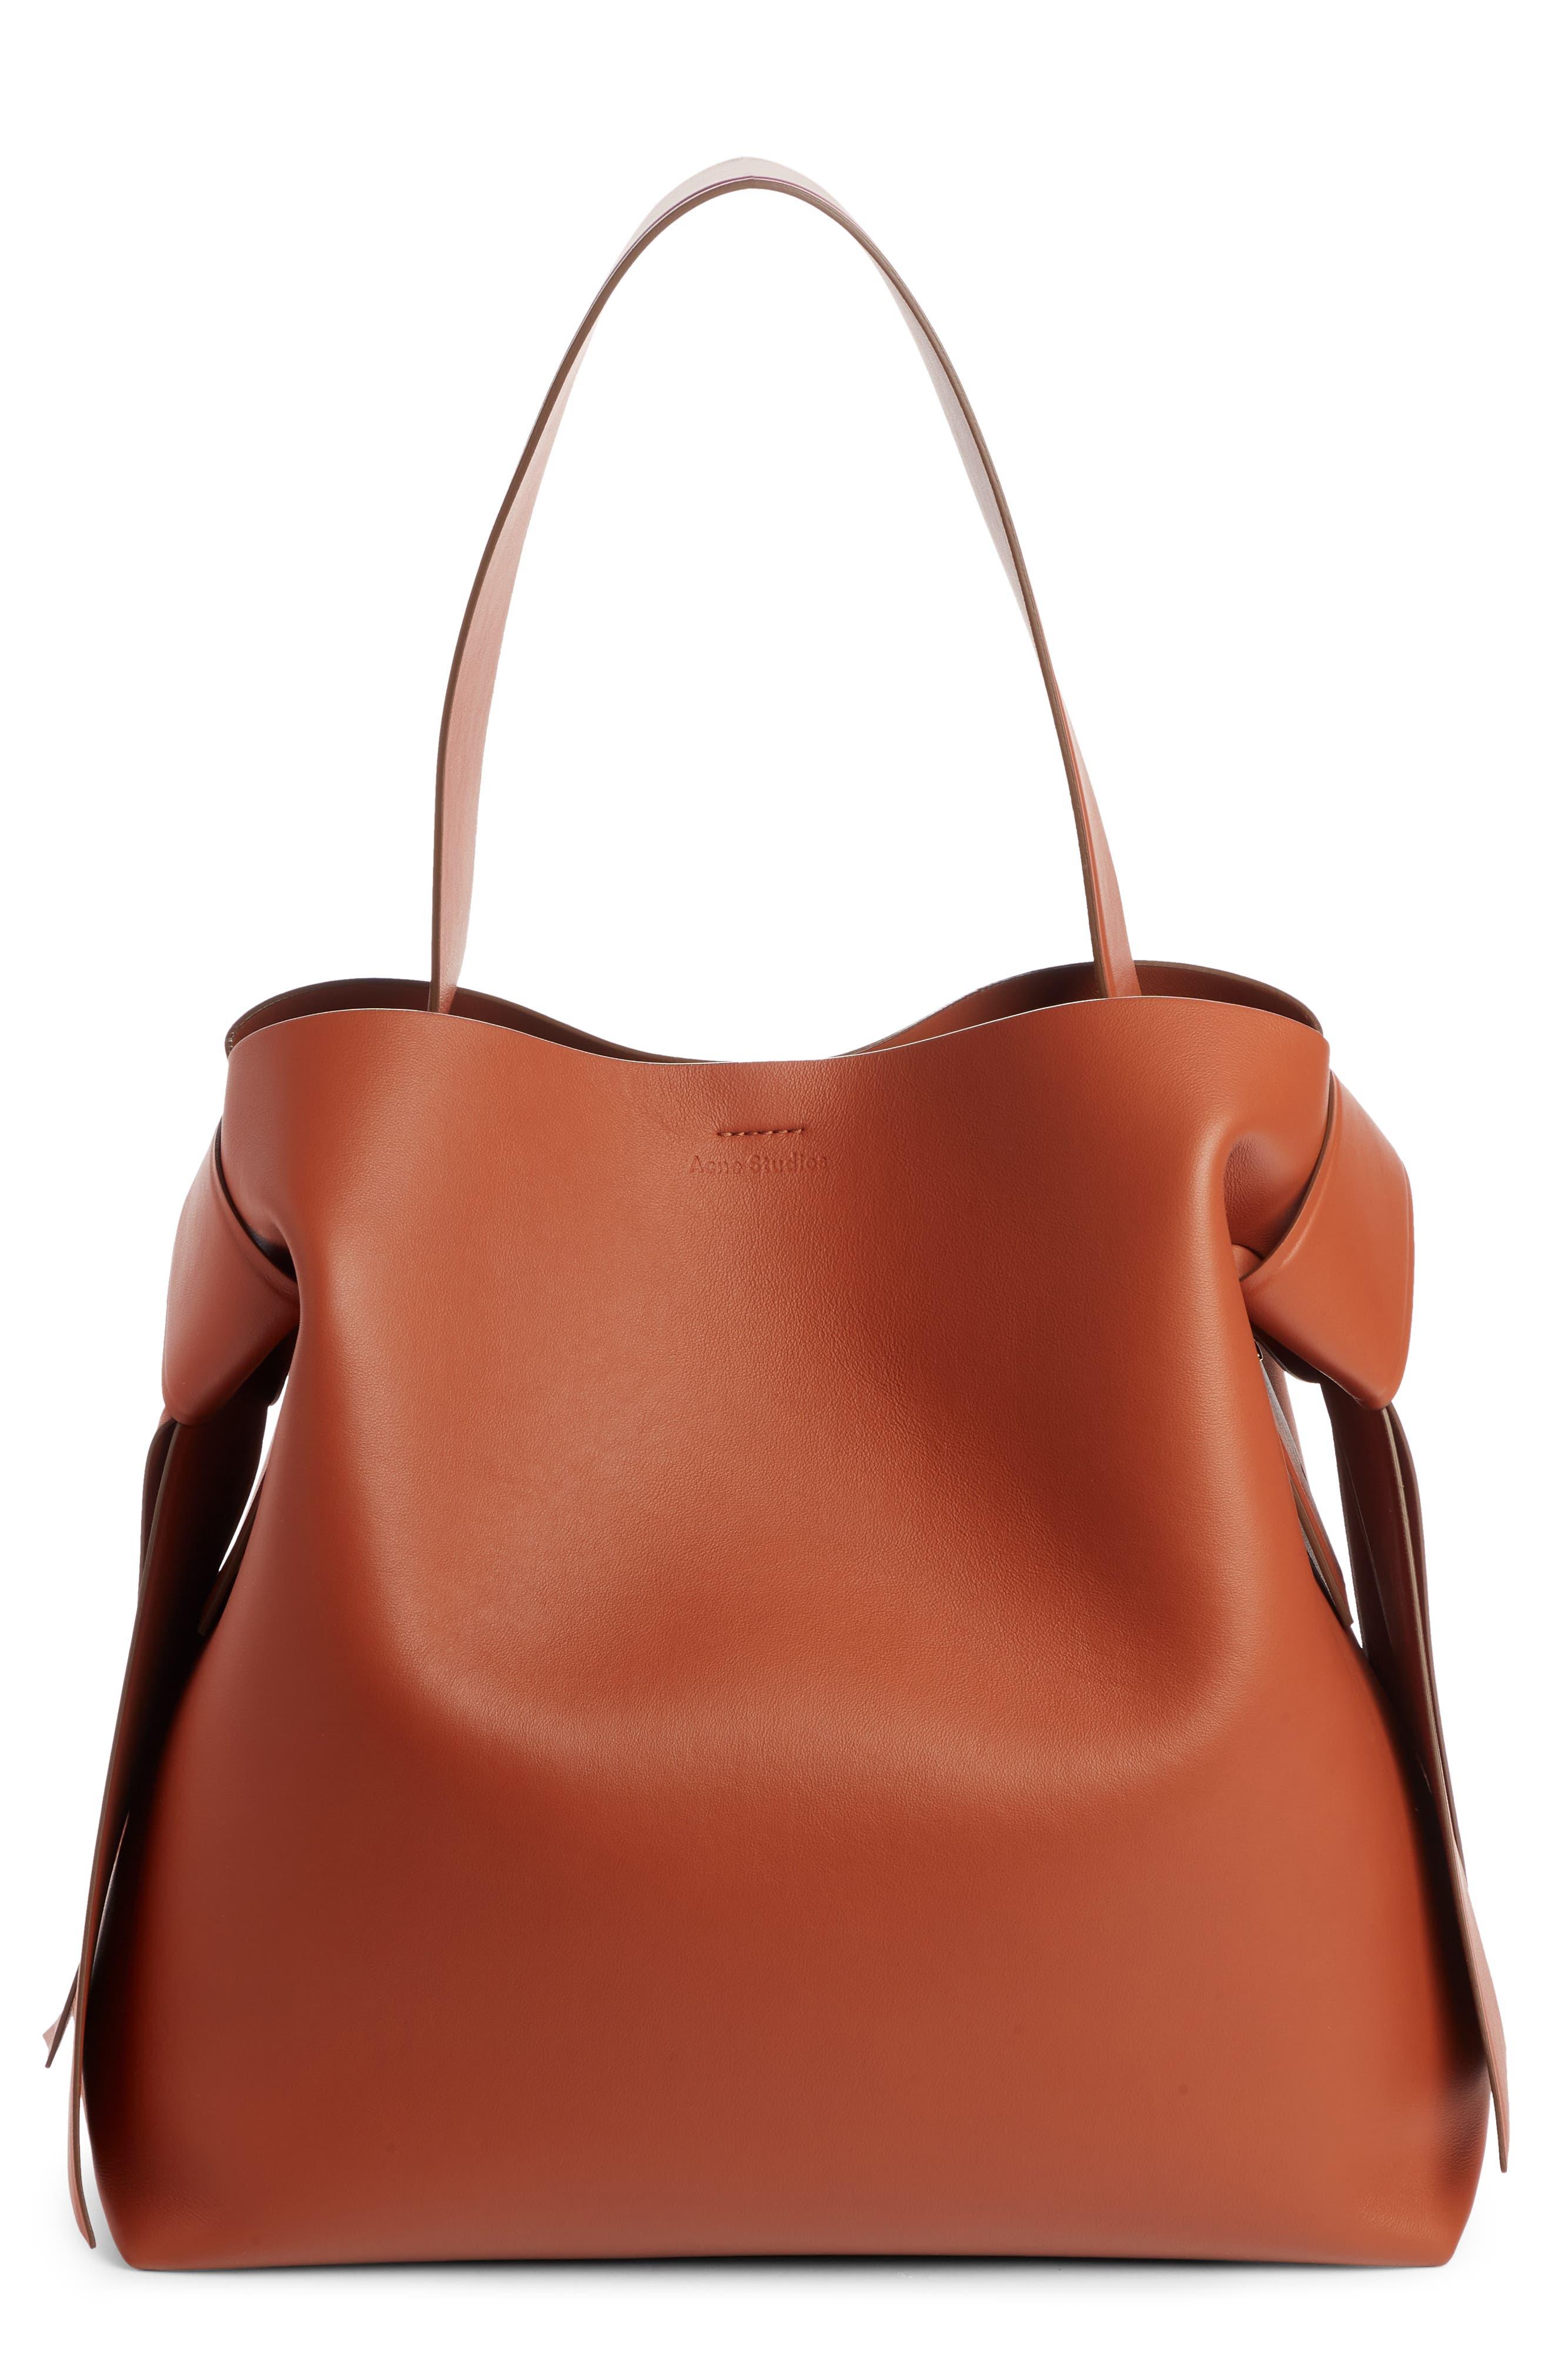 24095477daf Women's Shoulder Bags New Arrivals: Clothing, Shoes & Beauty | Nordstrom